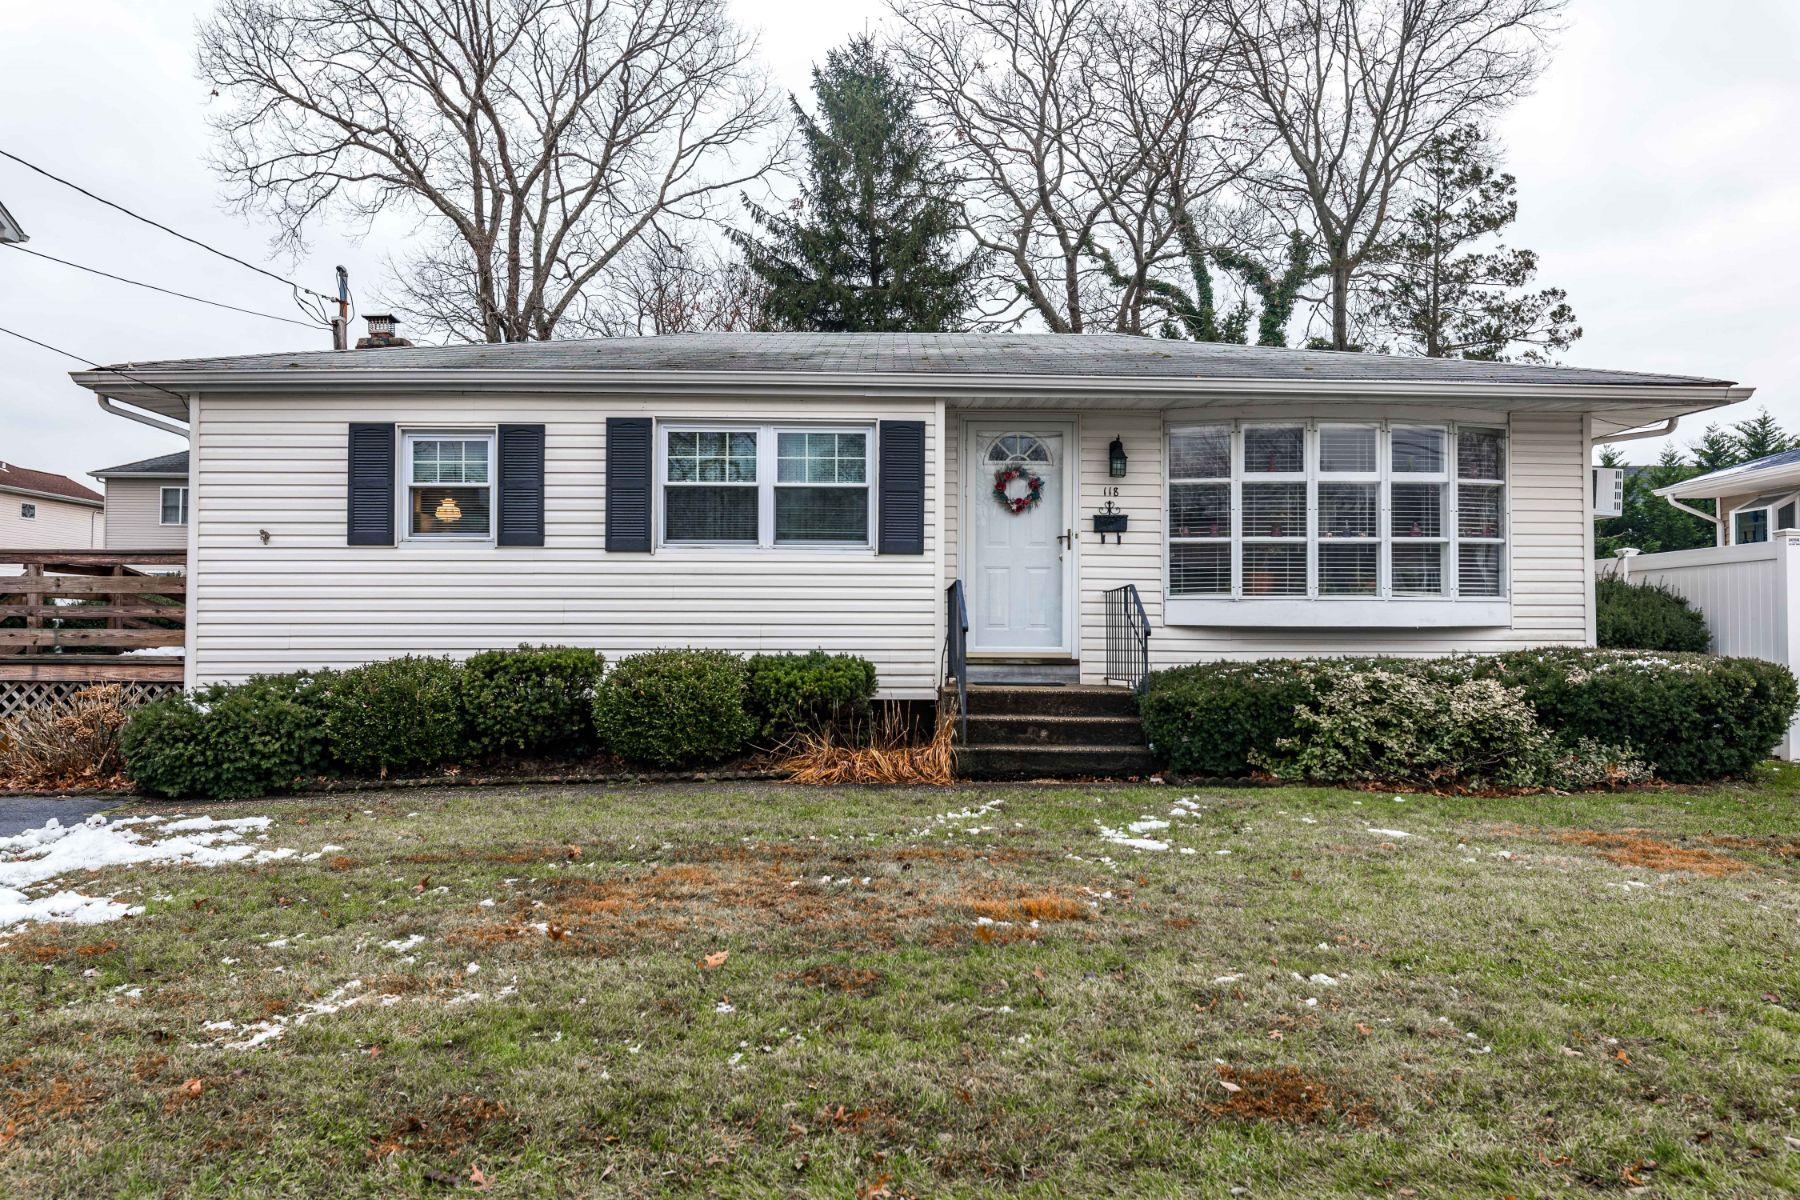 Single Family Homes for Sale at Massapequa 118 Rhode Island Avenue Massapequa, New York 11758 United States